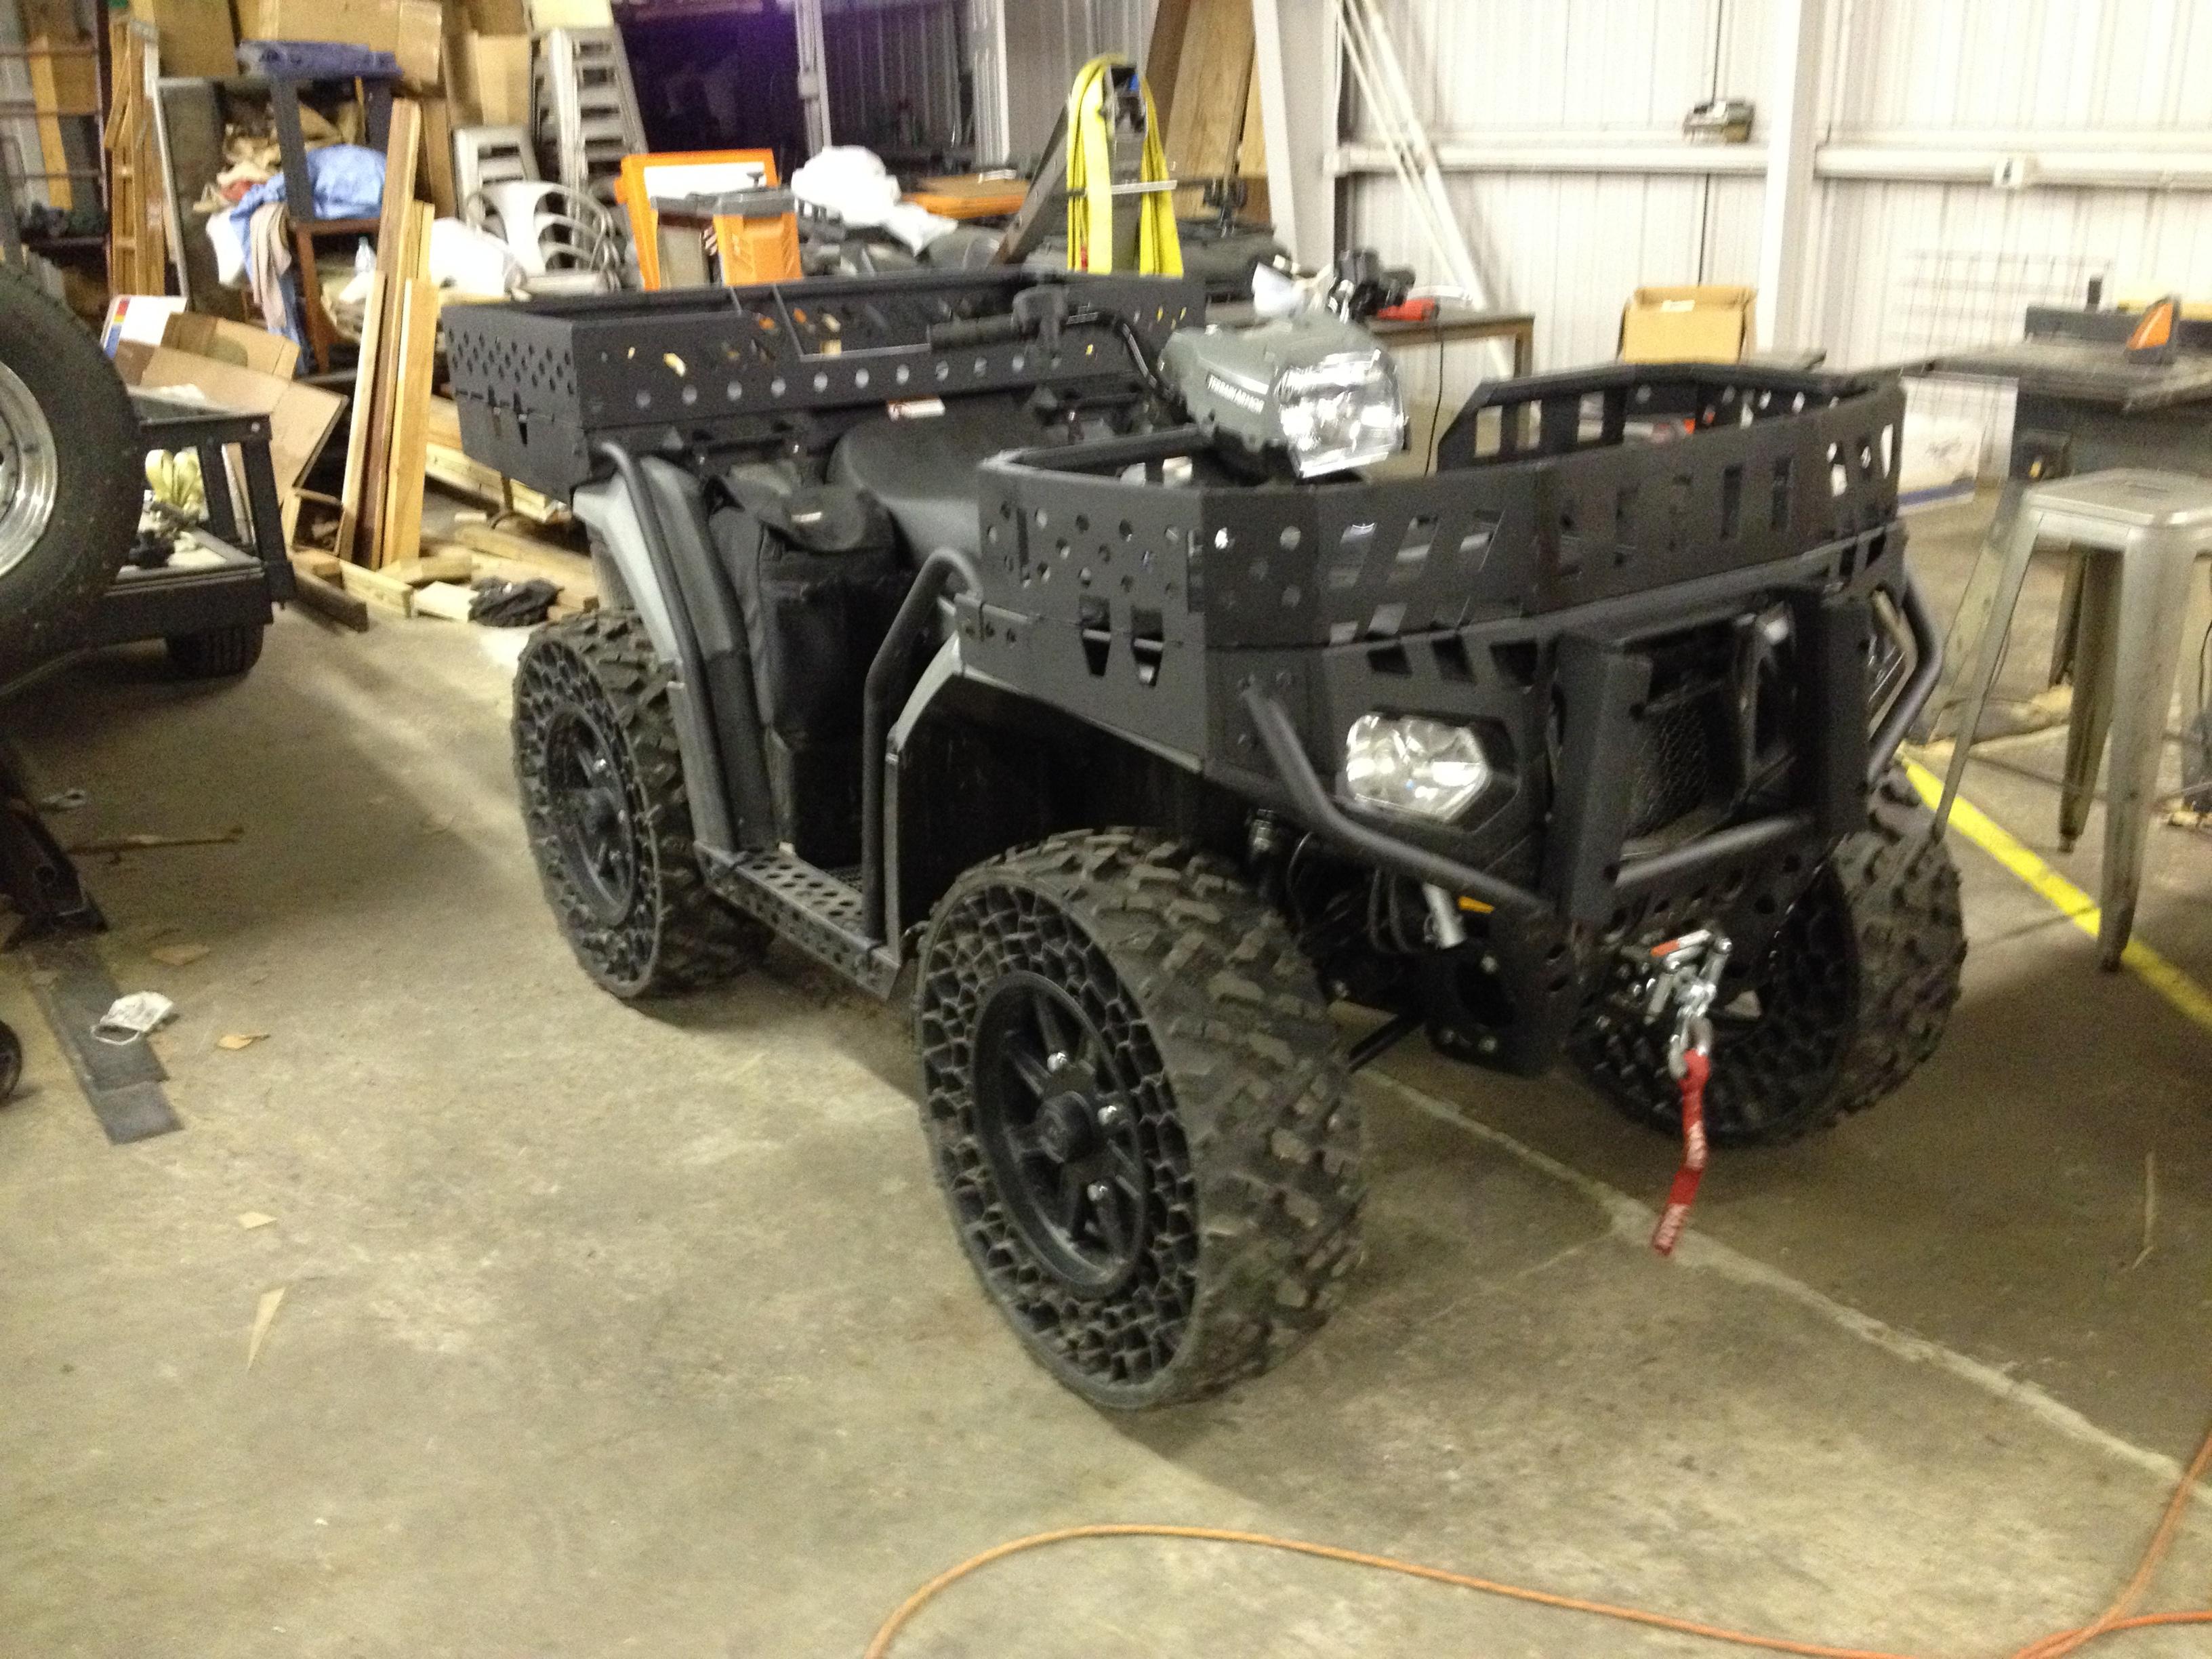 Cnc Machine For Sale >> Custom fabricated cnc cut racks - WV850 - Polaris ATV Forum